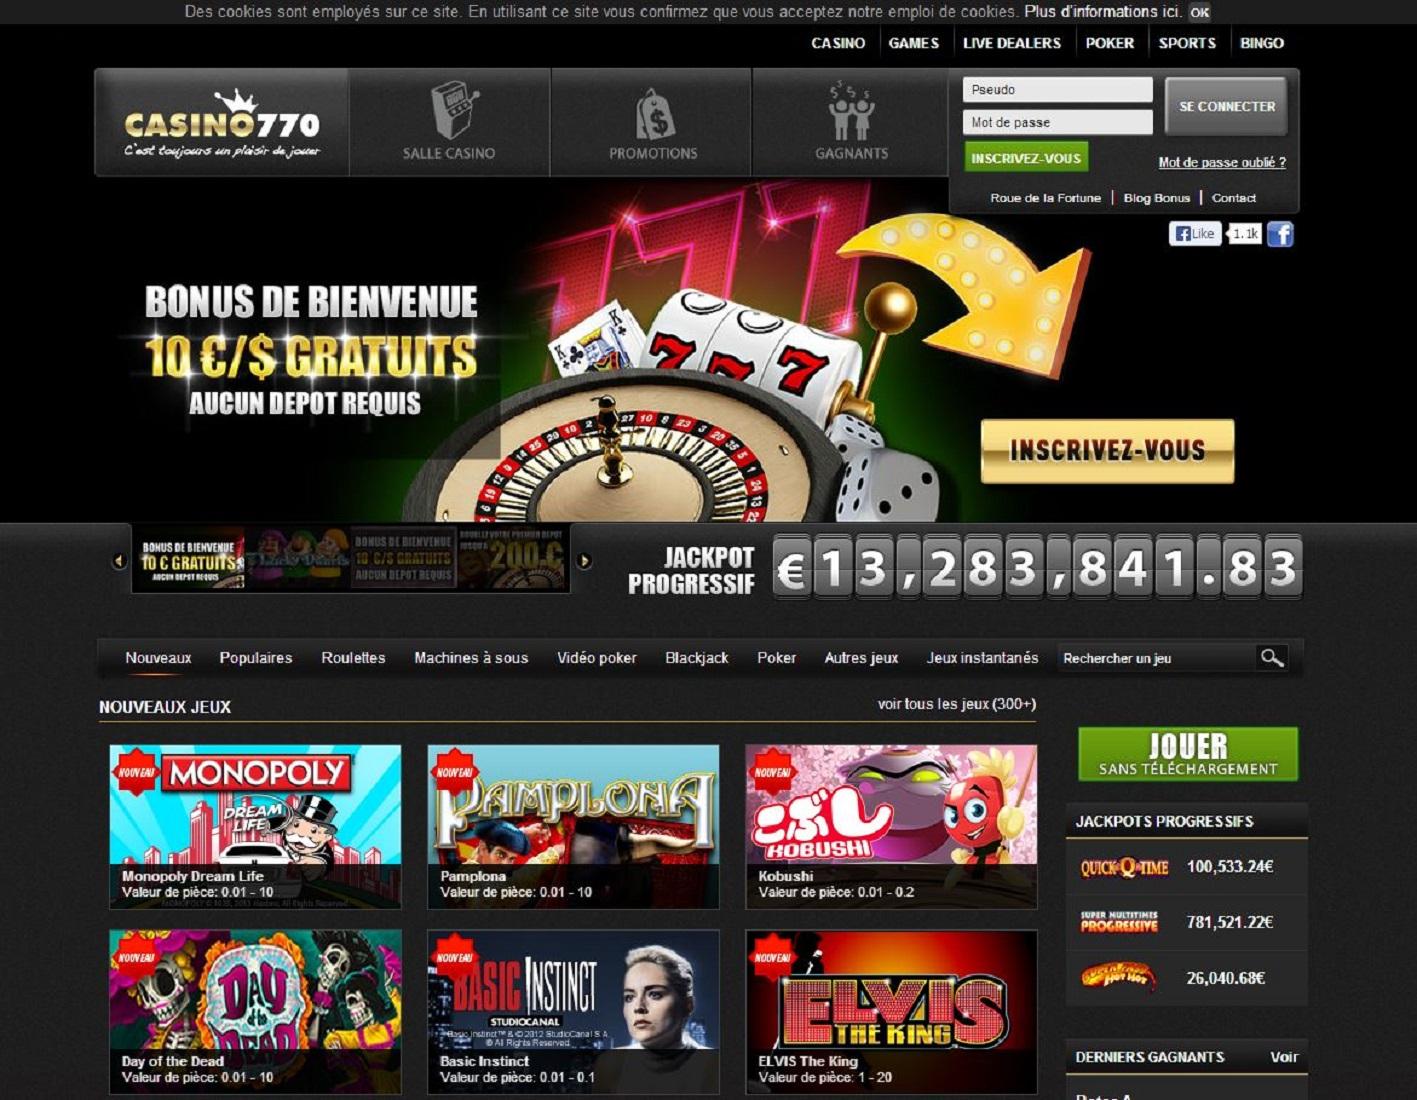 Avis 770 Casino : peut-on faire confiance à ce casino ?